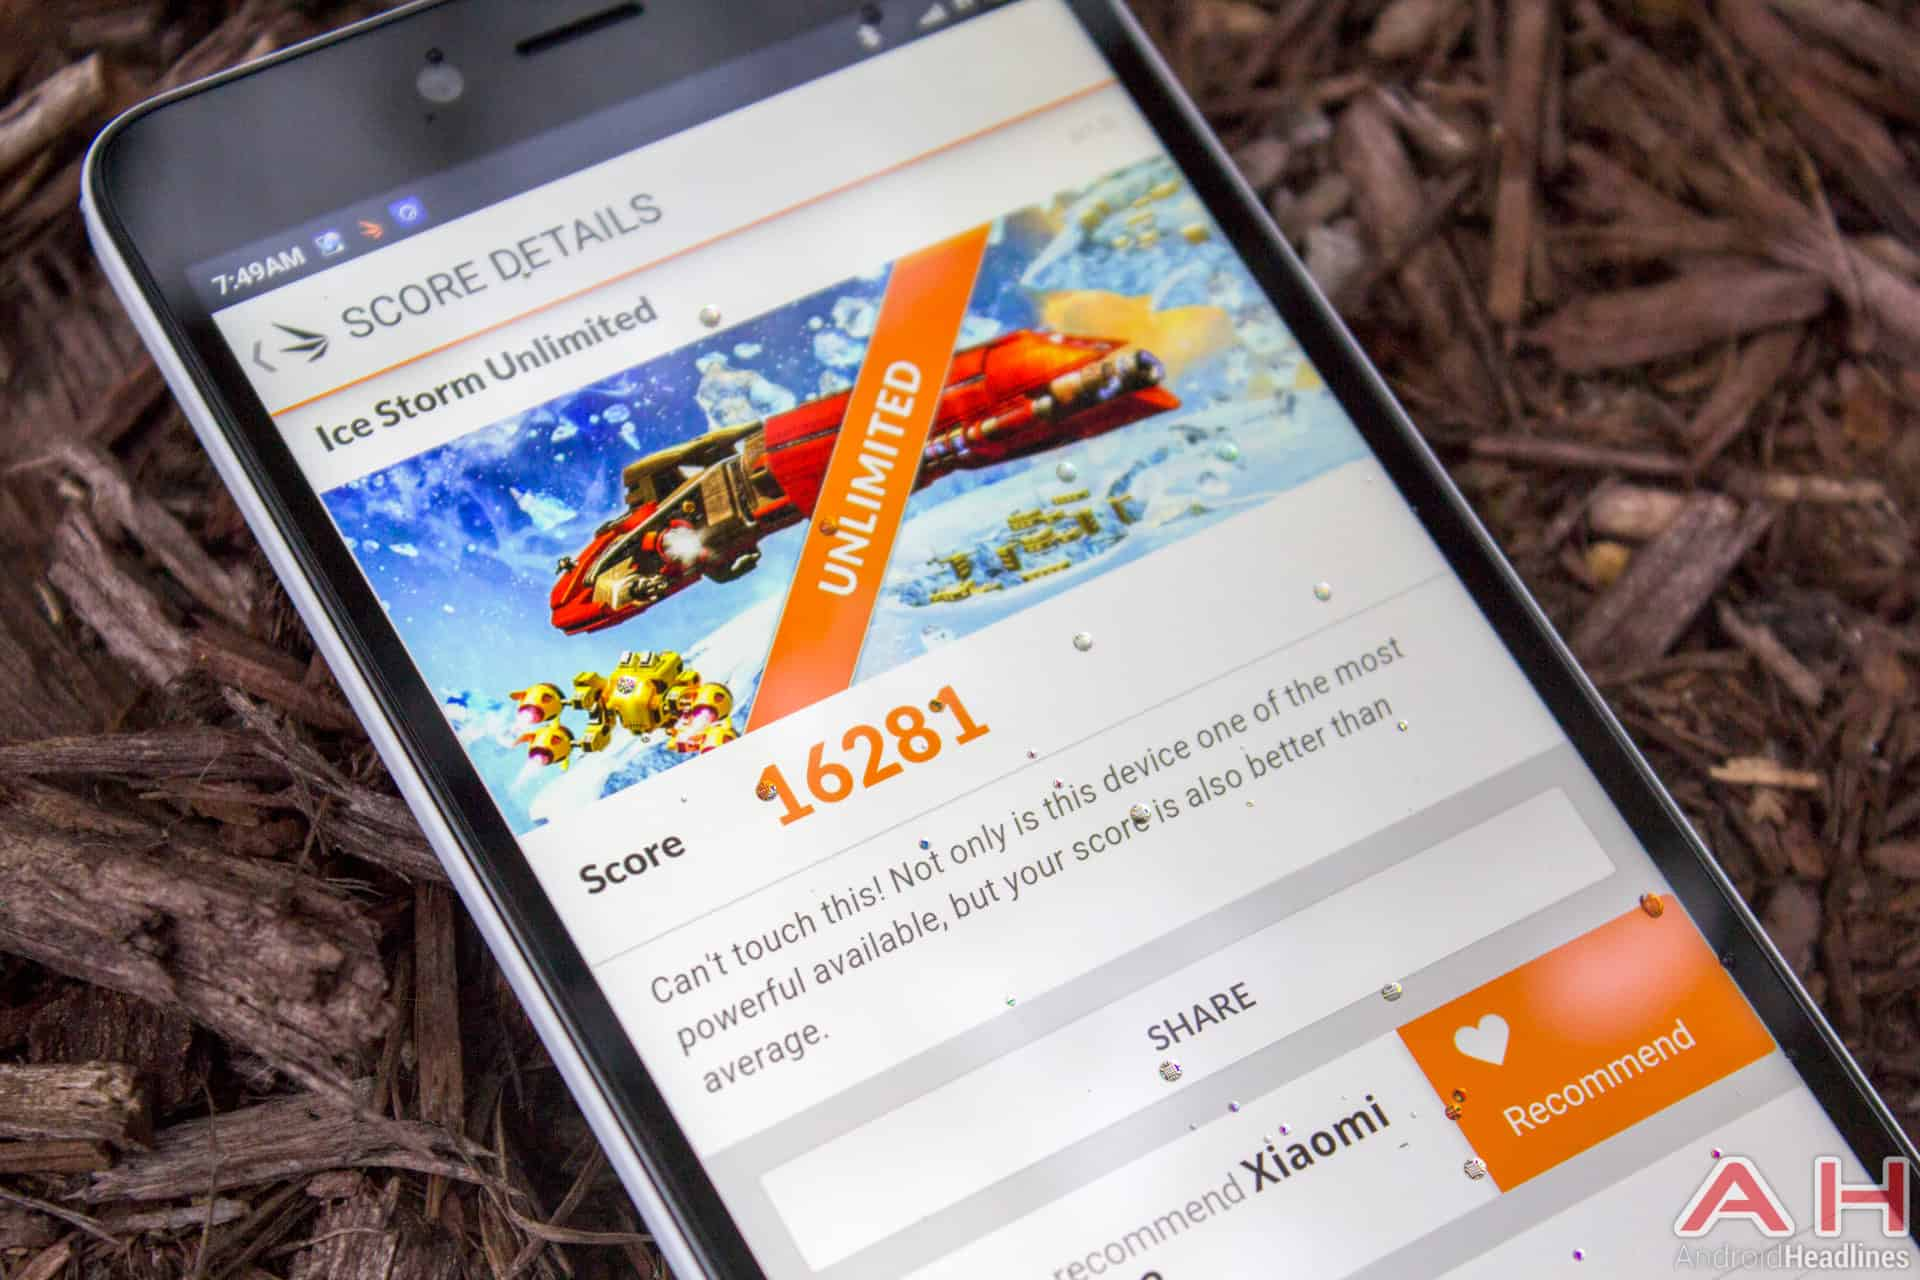 Xiaomi-Redmi-Note-2-AH-benchmarks